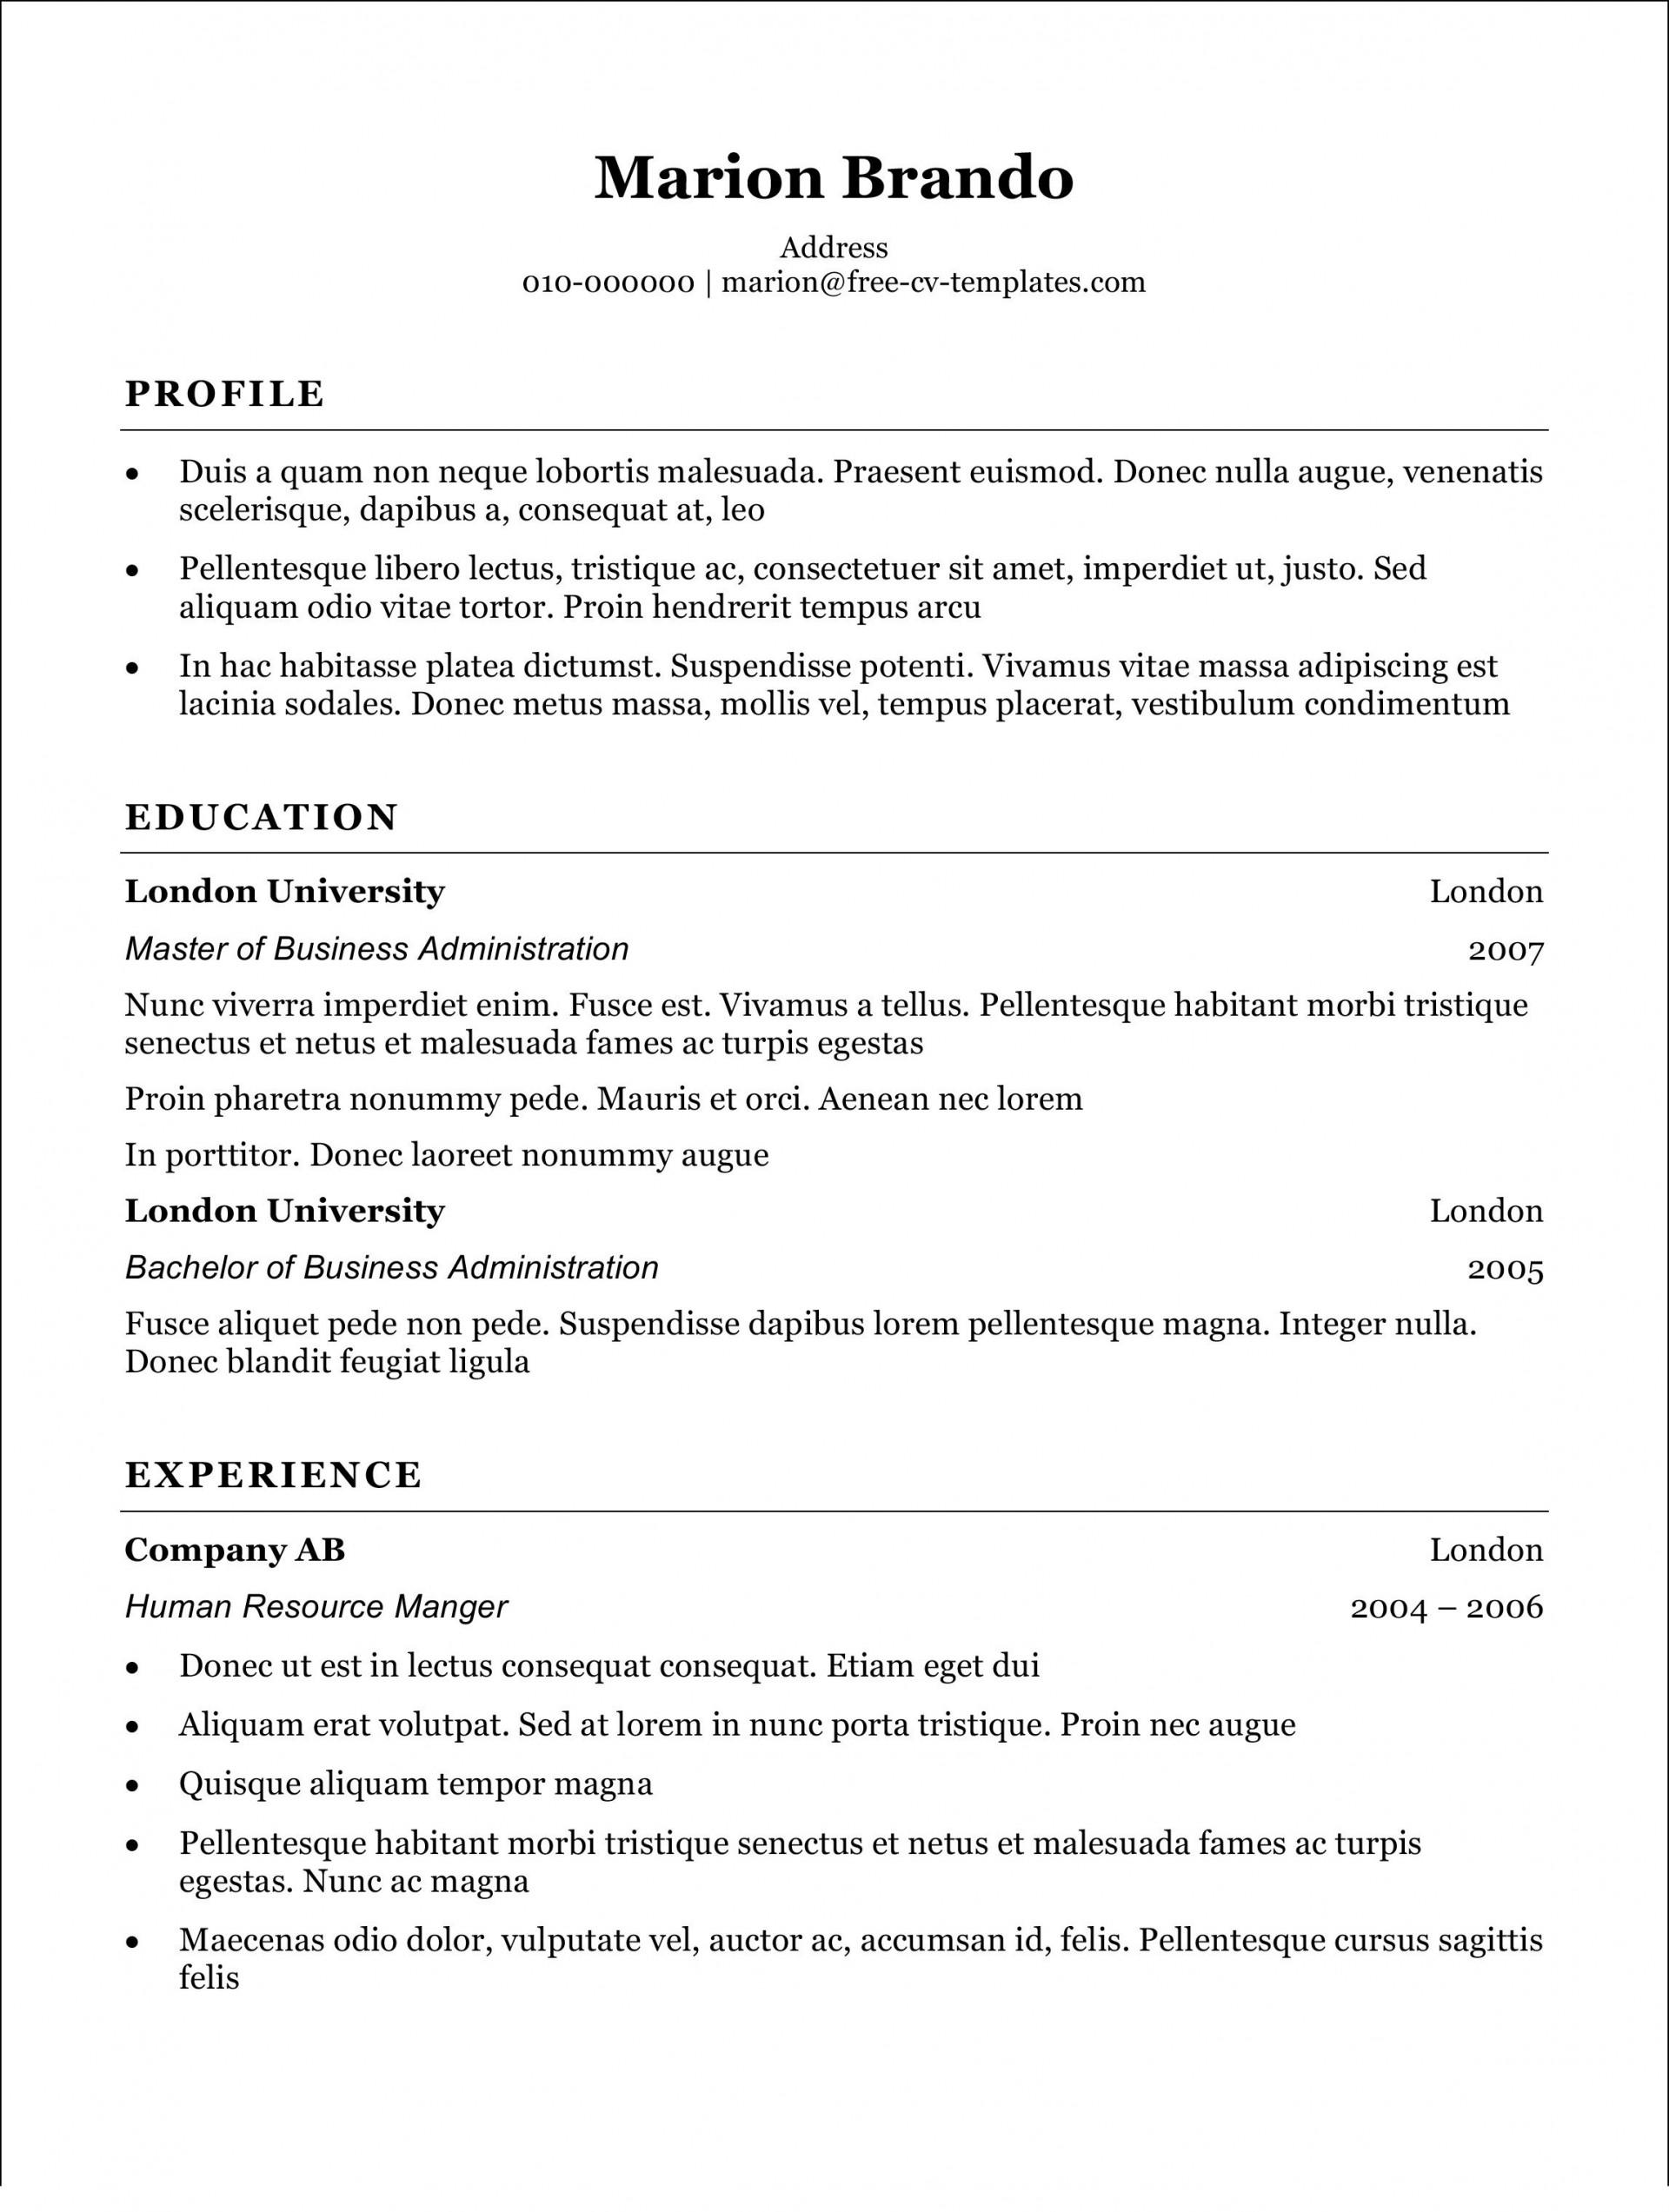 003 Singular Free Resume Template Microsoft Office Word 2007 Image 1920